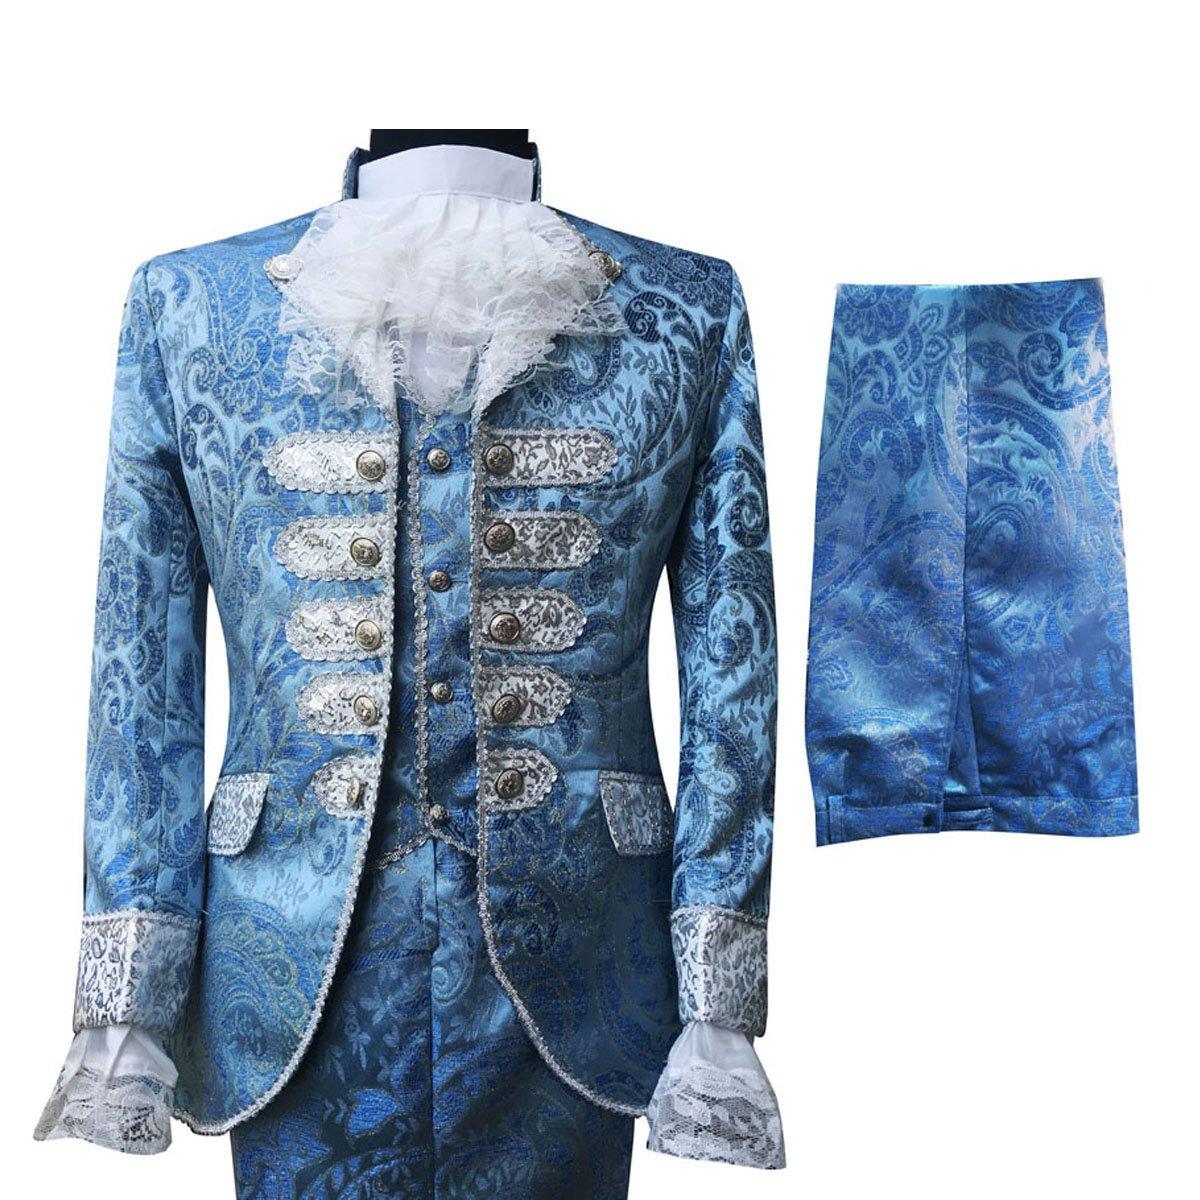 Cloudstyle Mens Dinner Suit Tuxedo Slim Fit Wedding Three Piece Suits Retro Blue